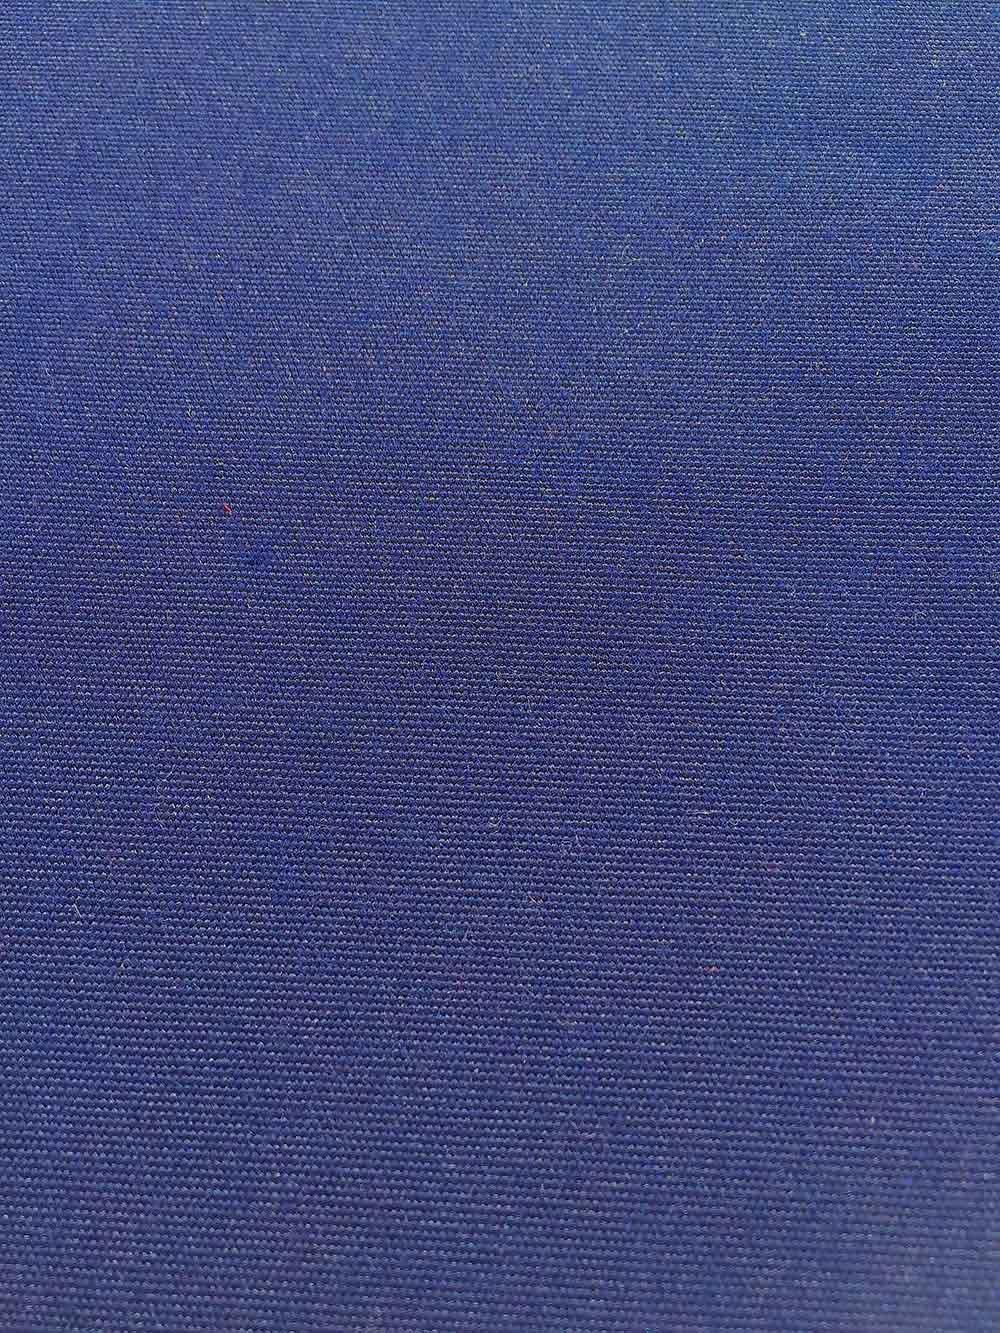 acryl doek marine blauw